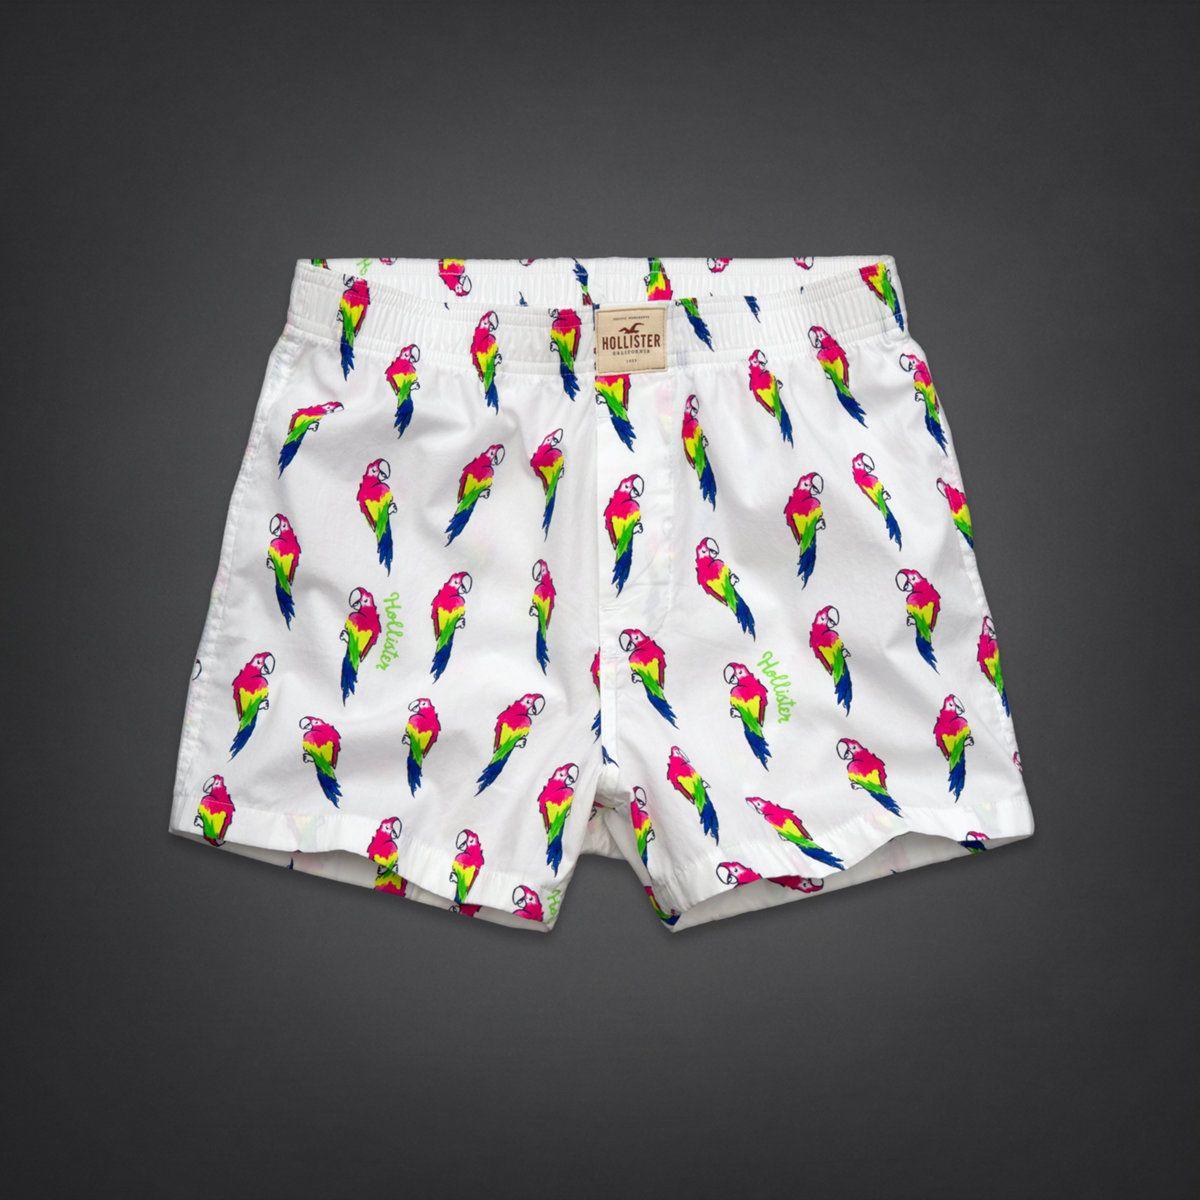 Dudes Faria Beach Boxers   Dudes Underwear   HollisterCo.com